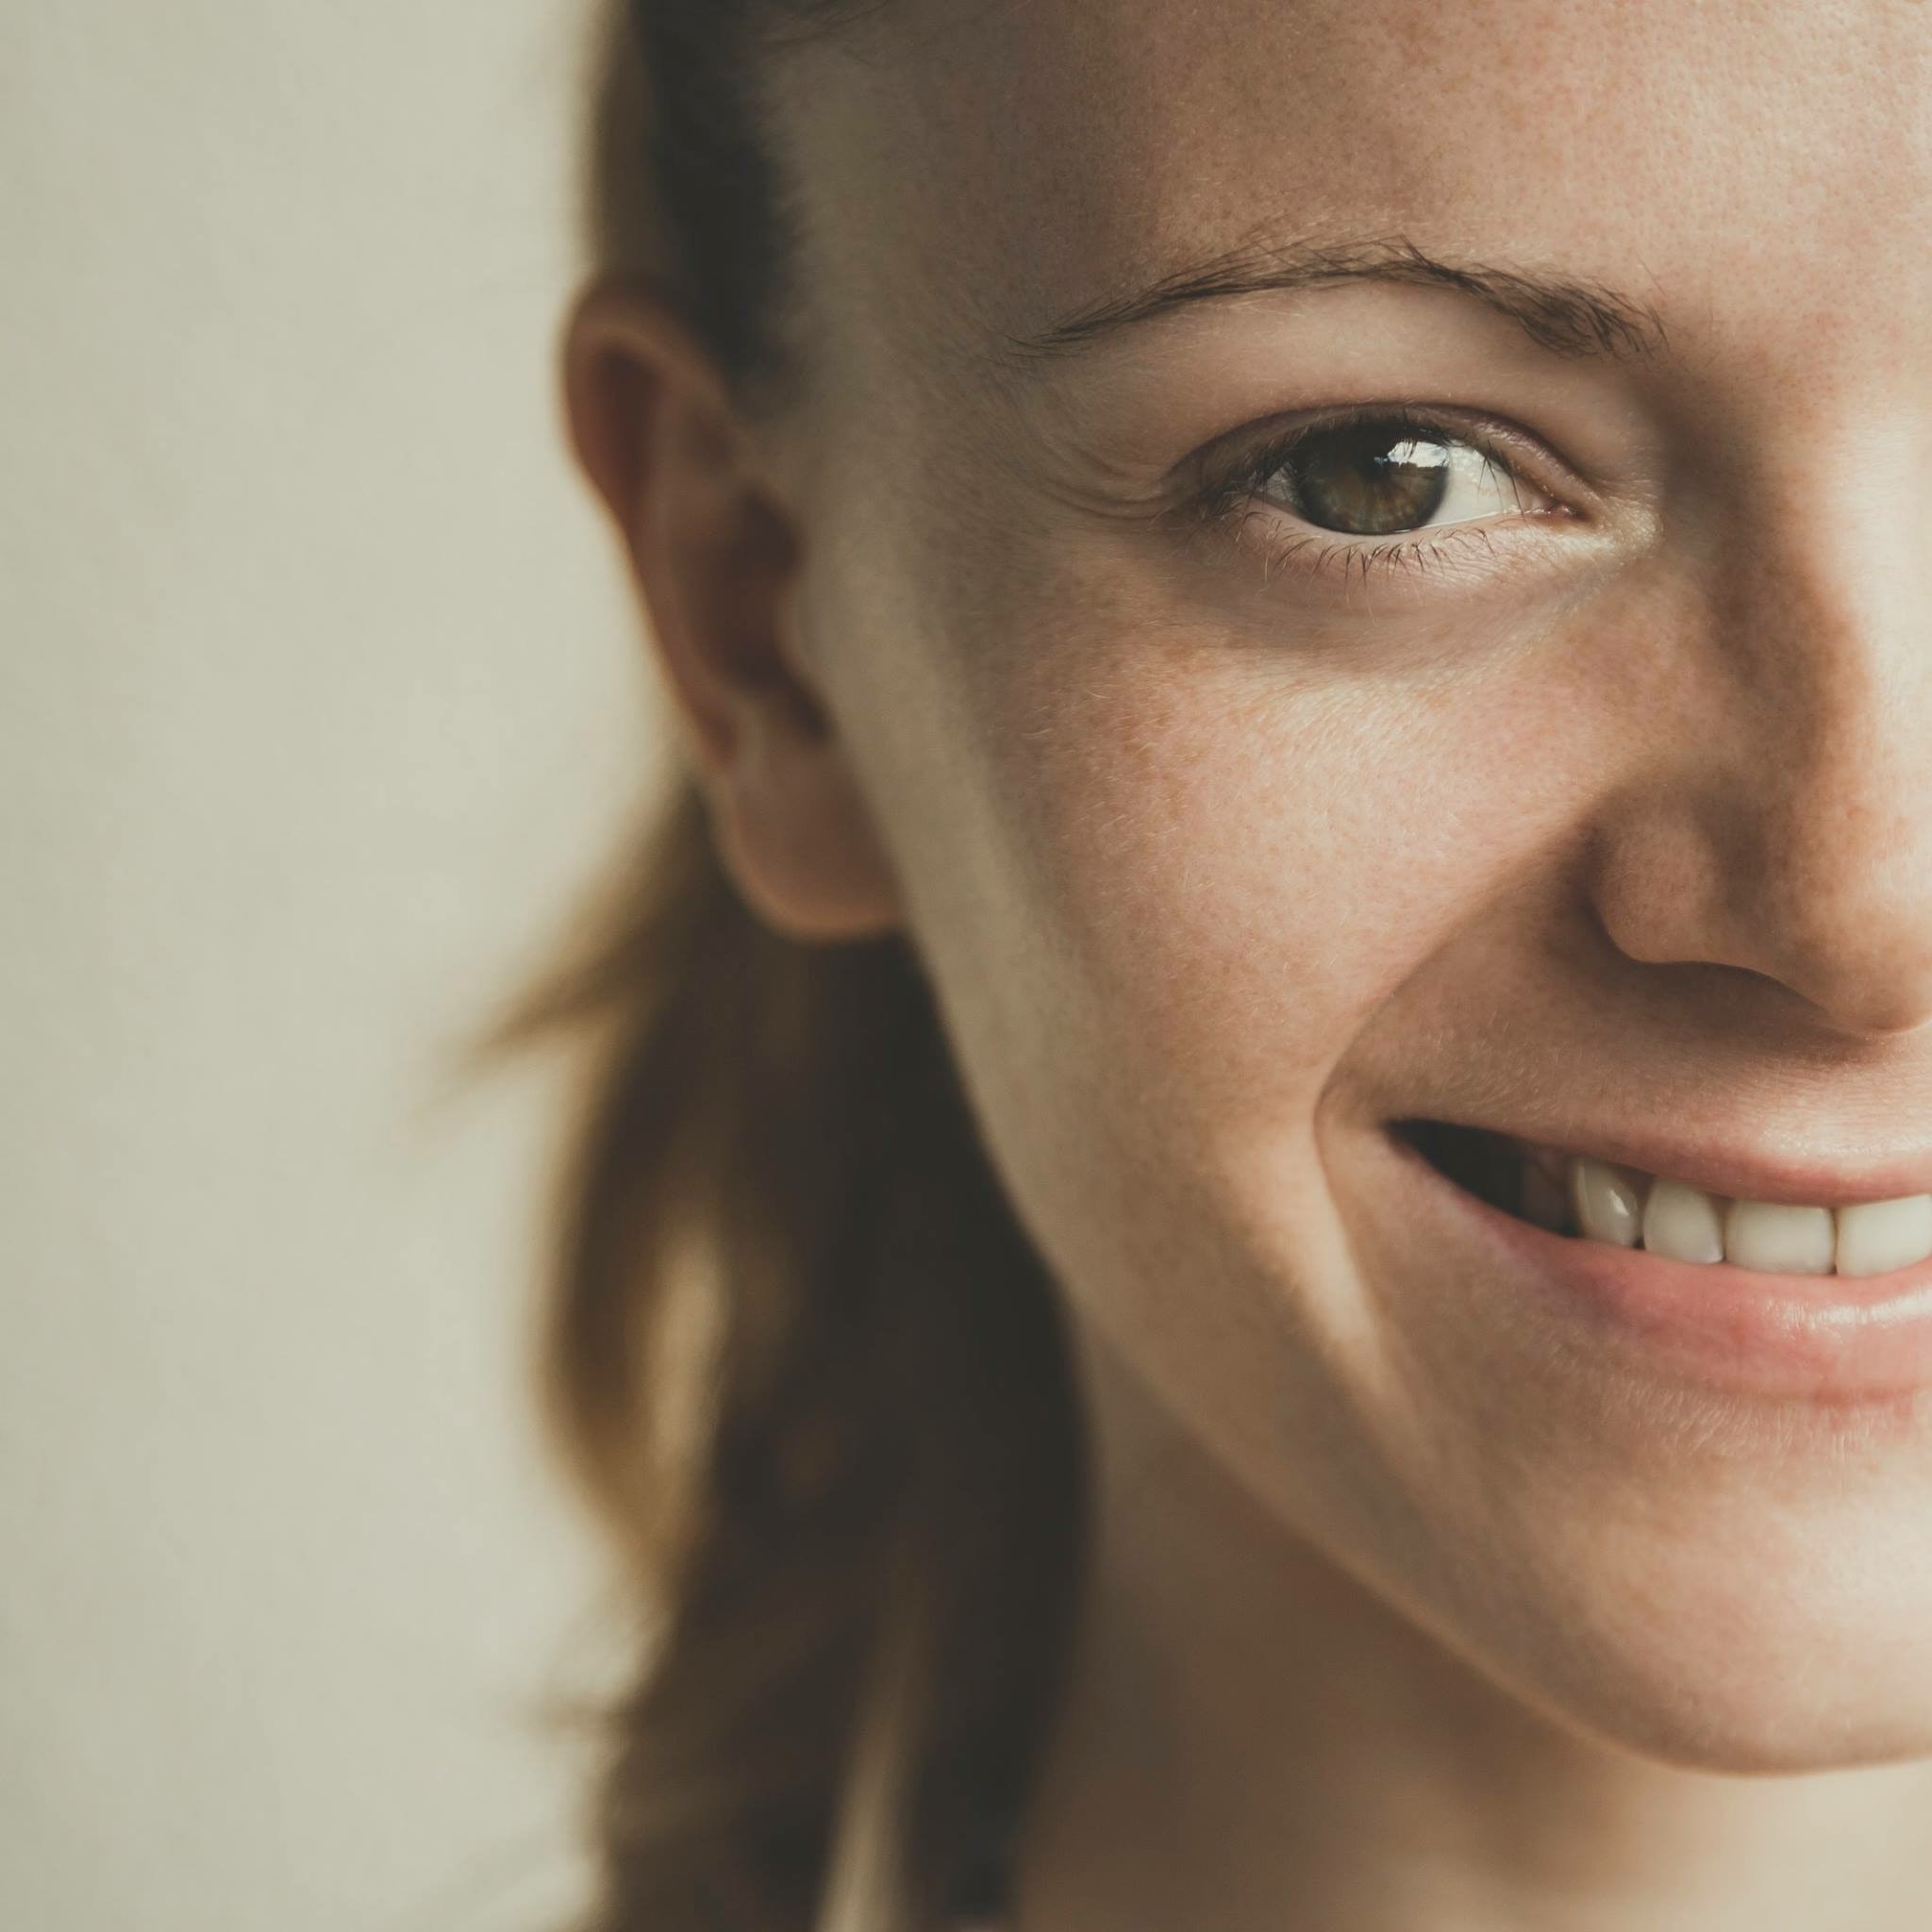 Go to Andrea Klimenko's profile